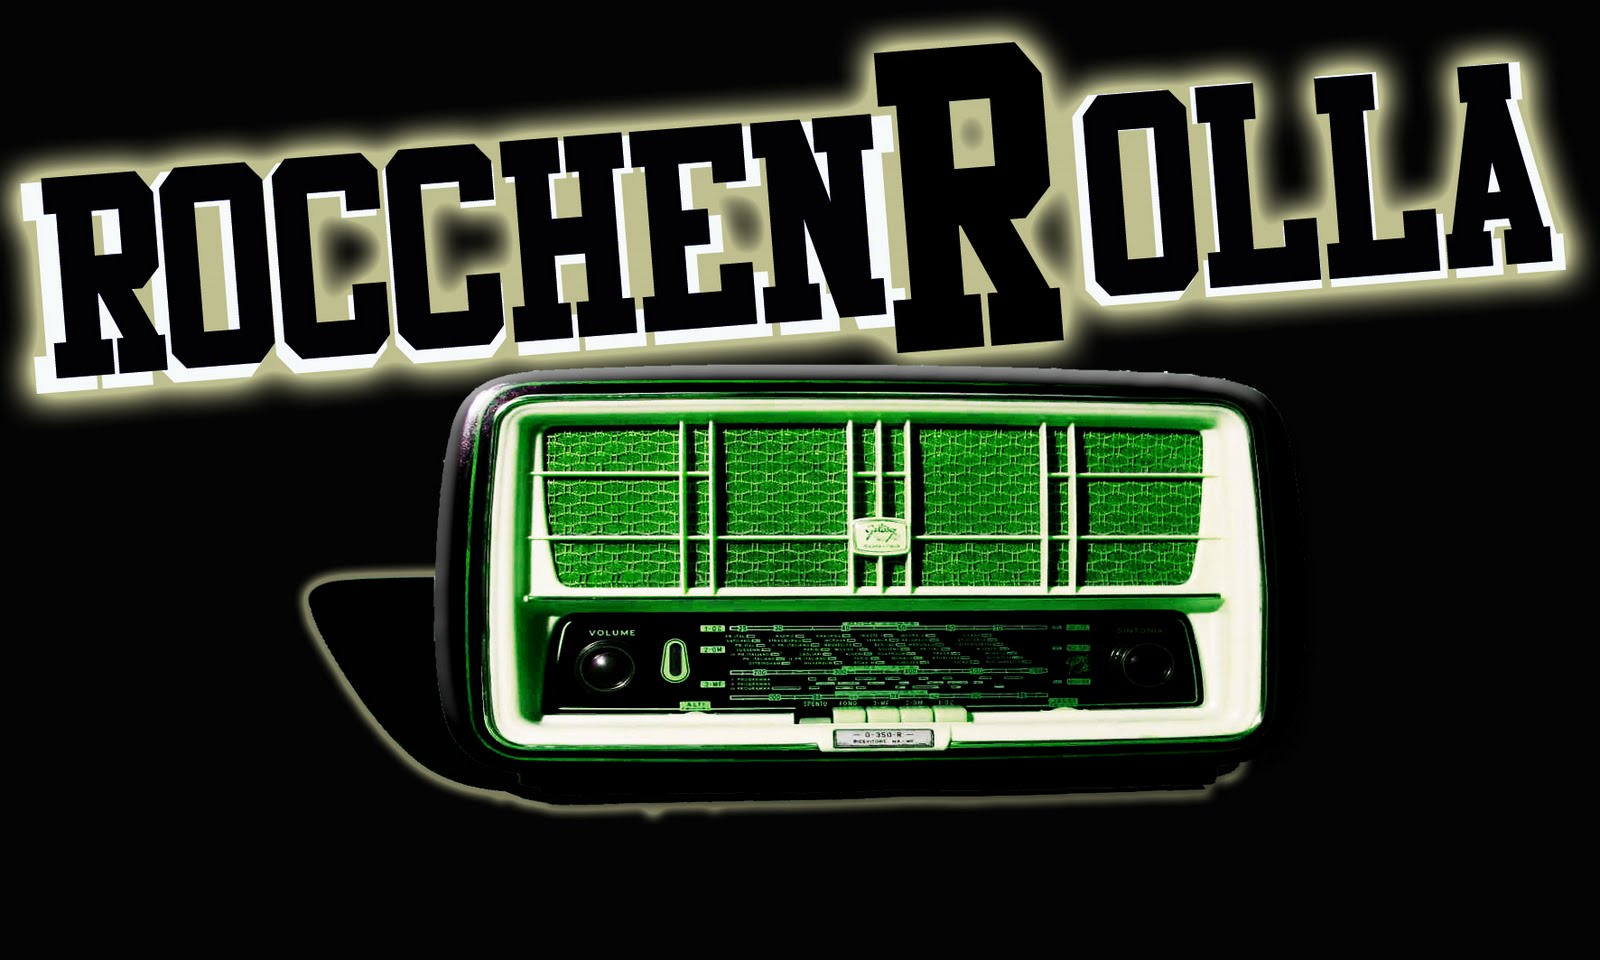 Rocchenrolla